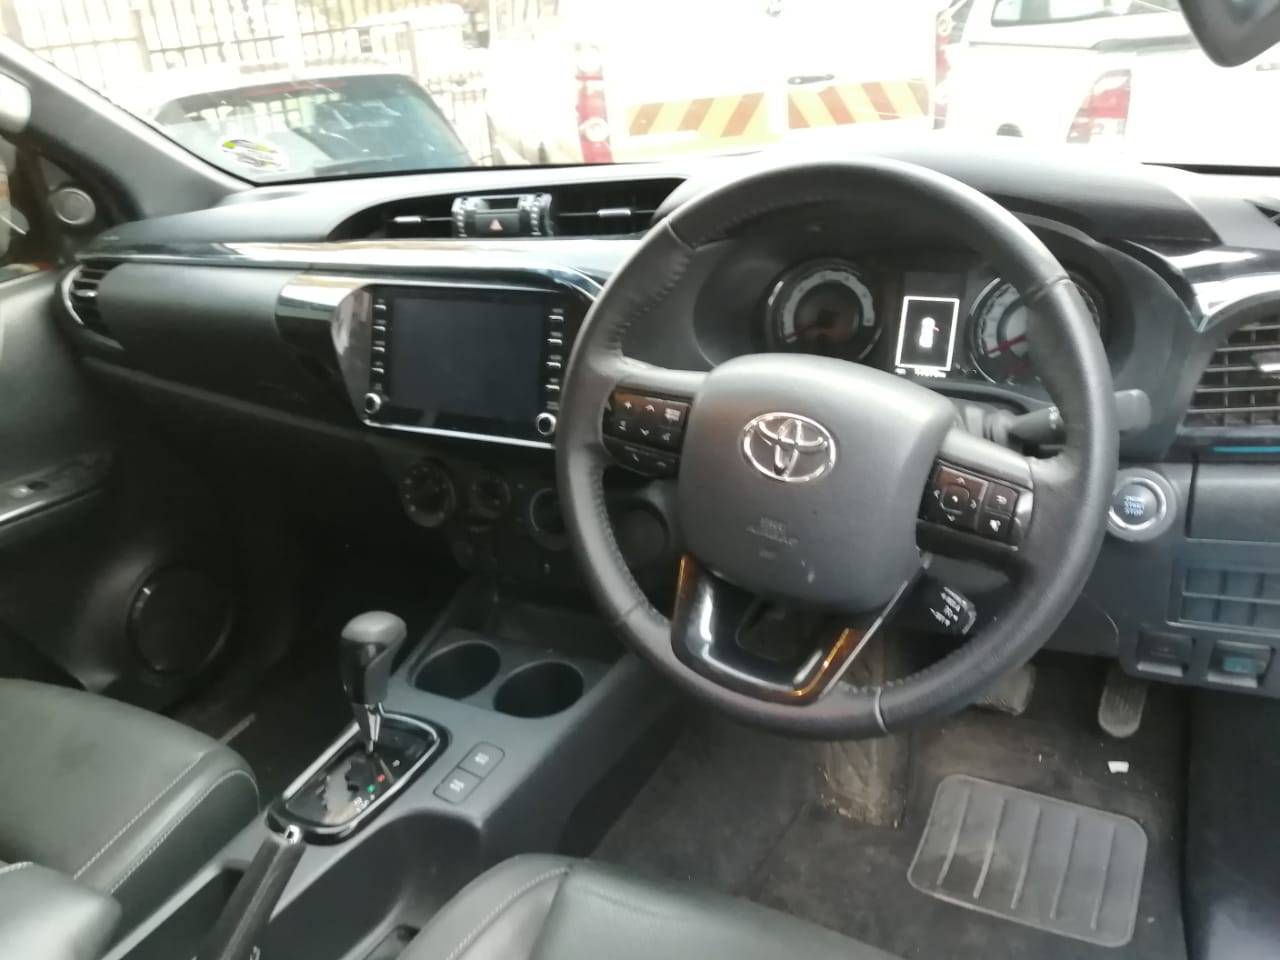 2020 Toyota Hilux 2.8 GD-6 Legend 50